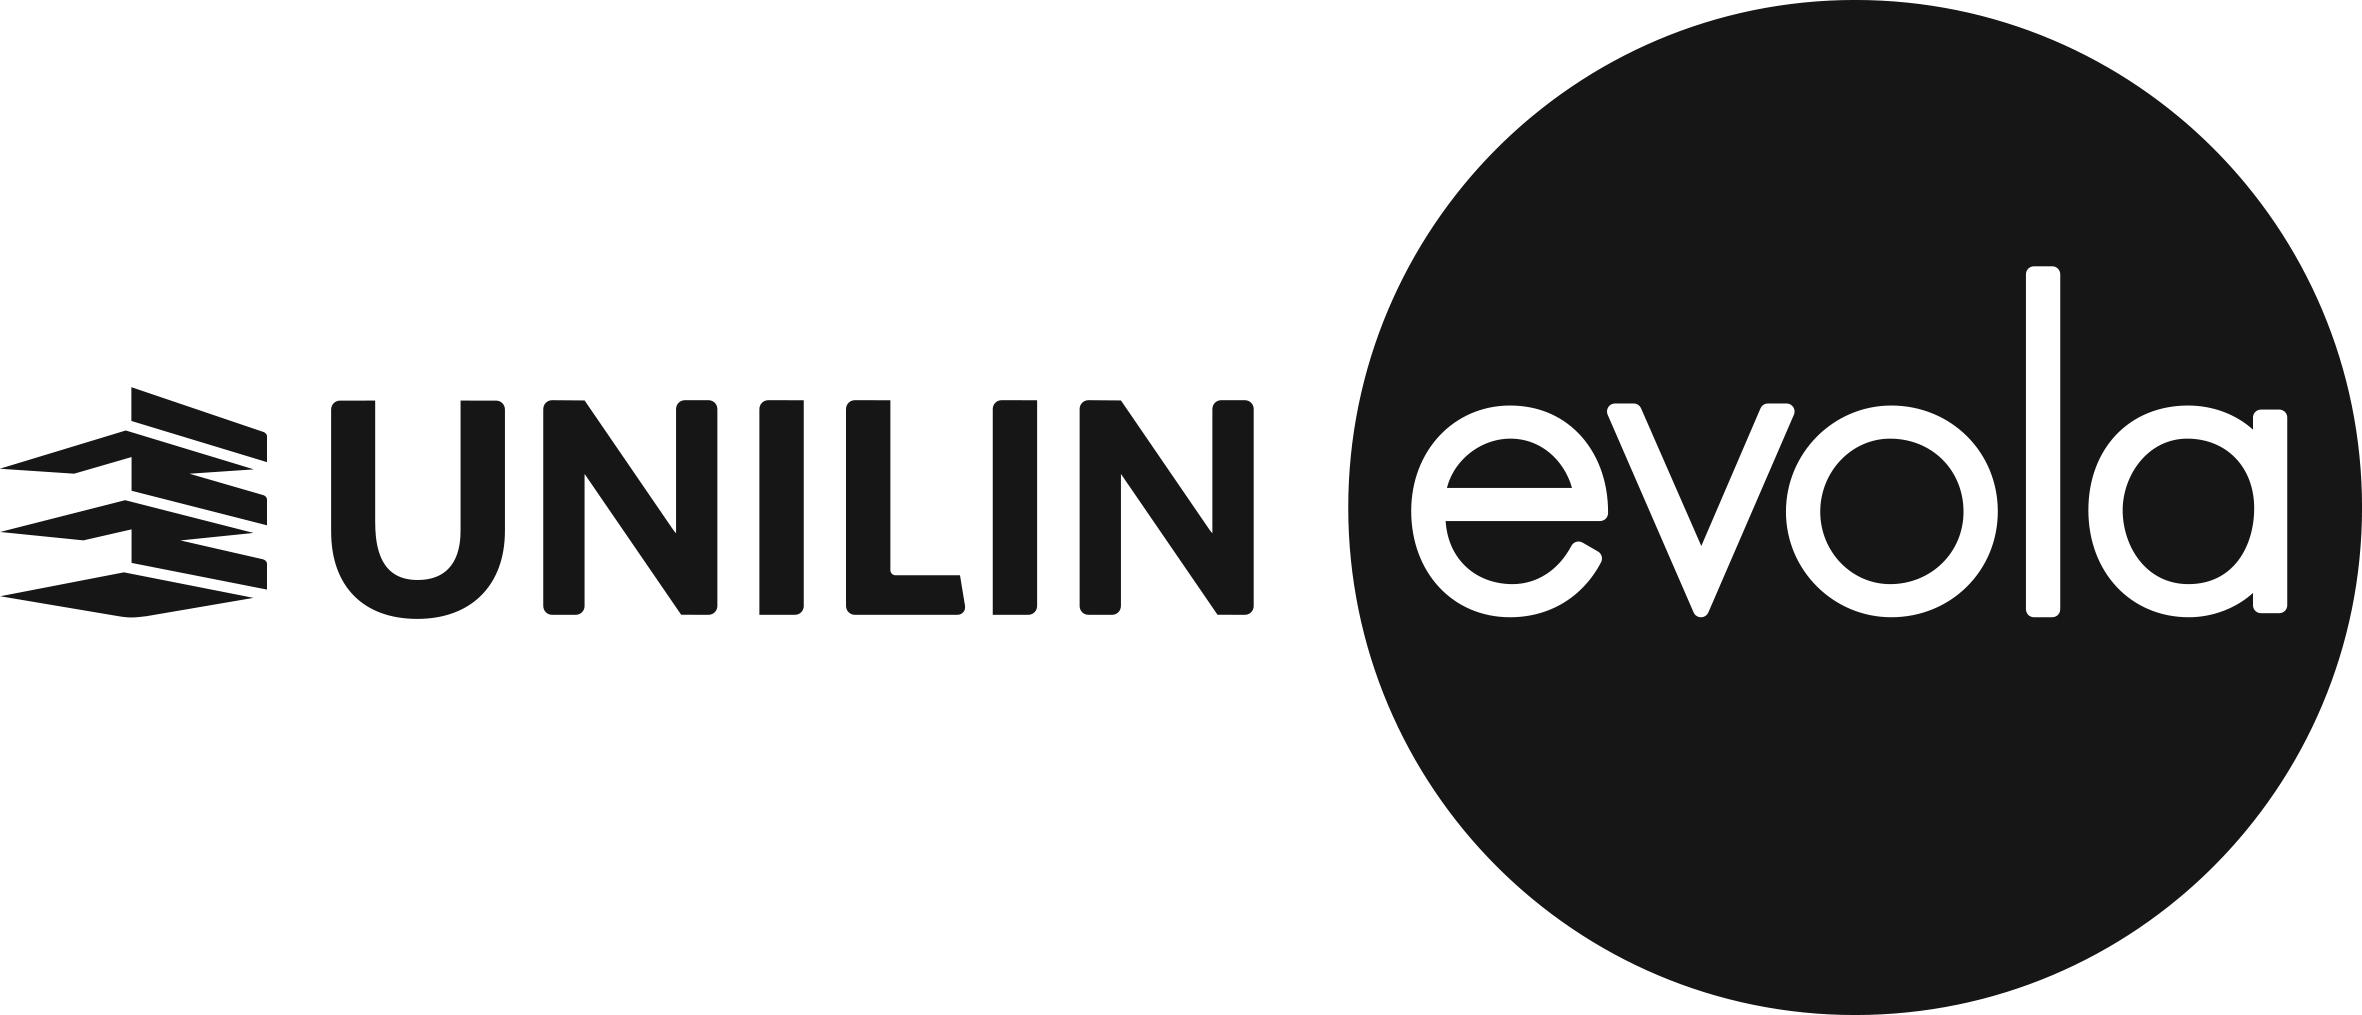 unilin-evola.png